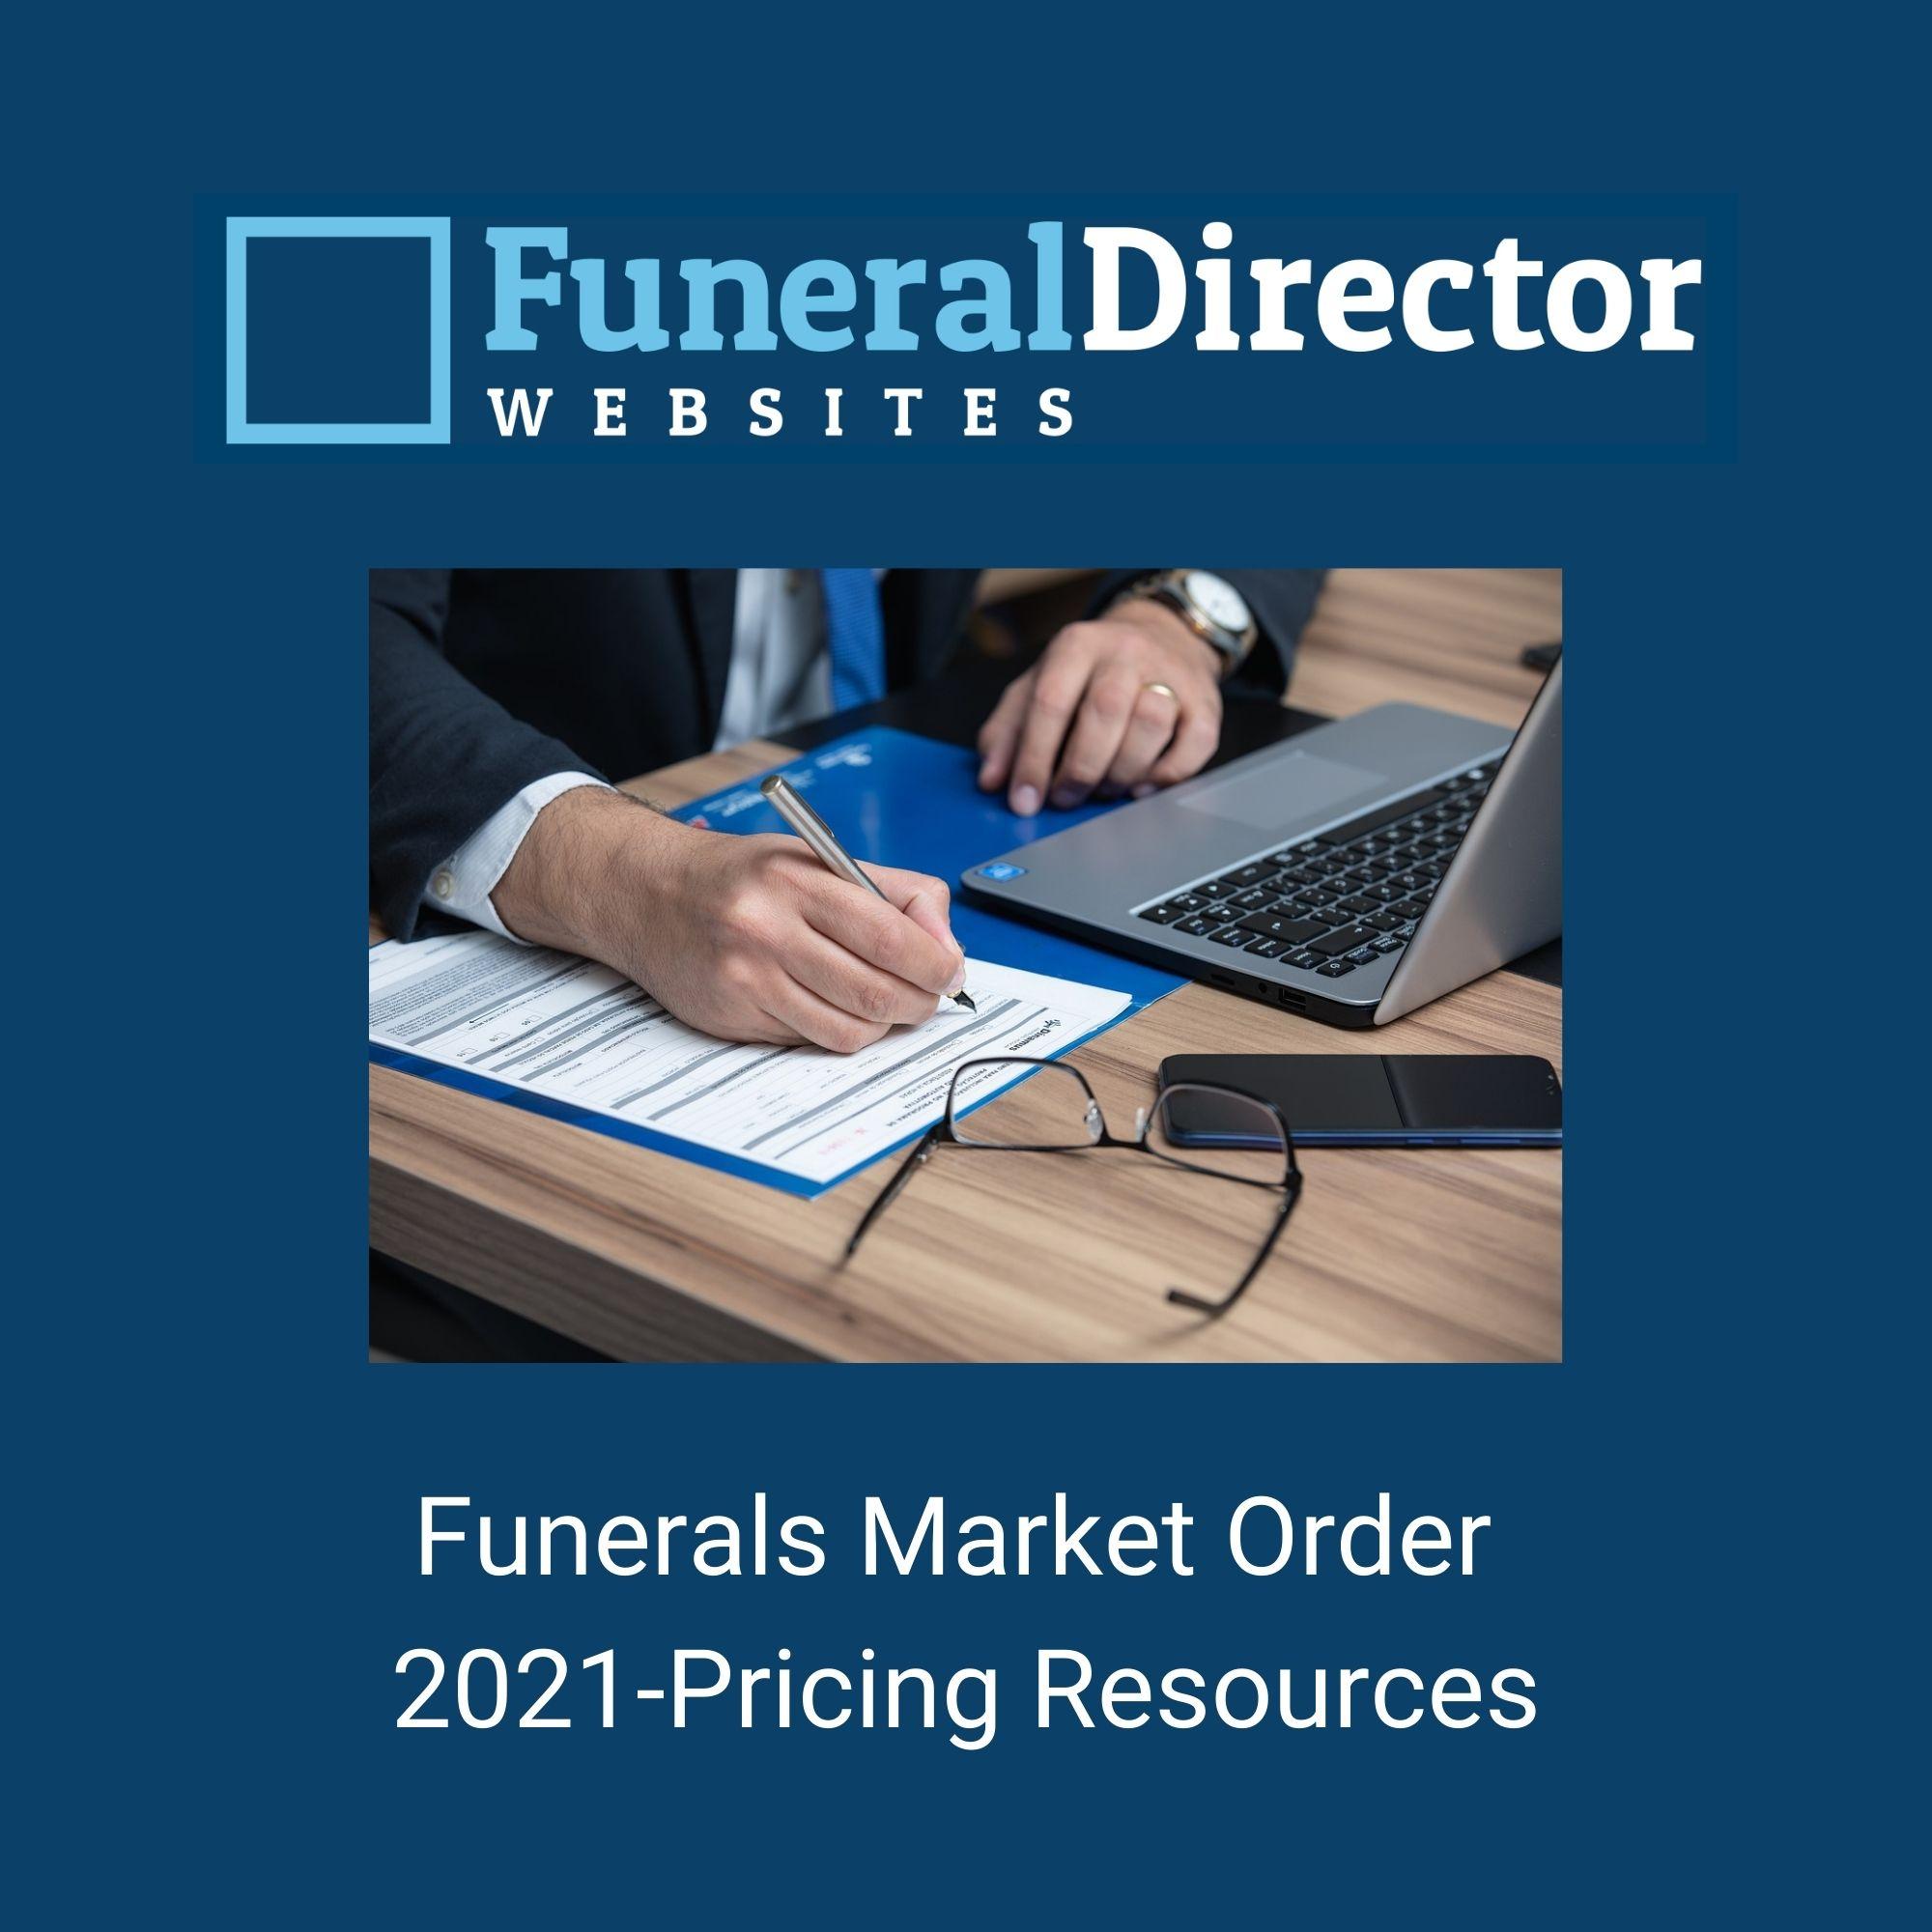 Funerals Market Order 2021-Pricing Resources